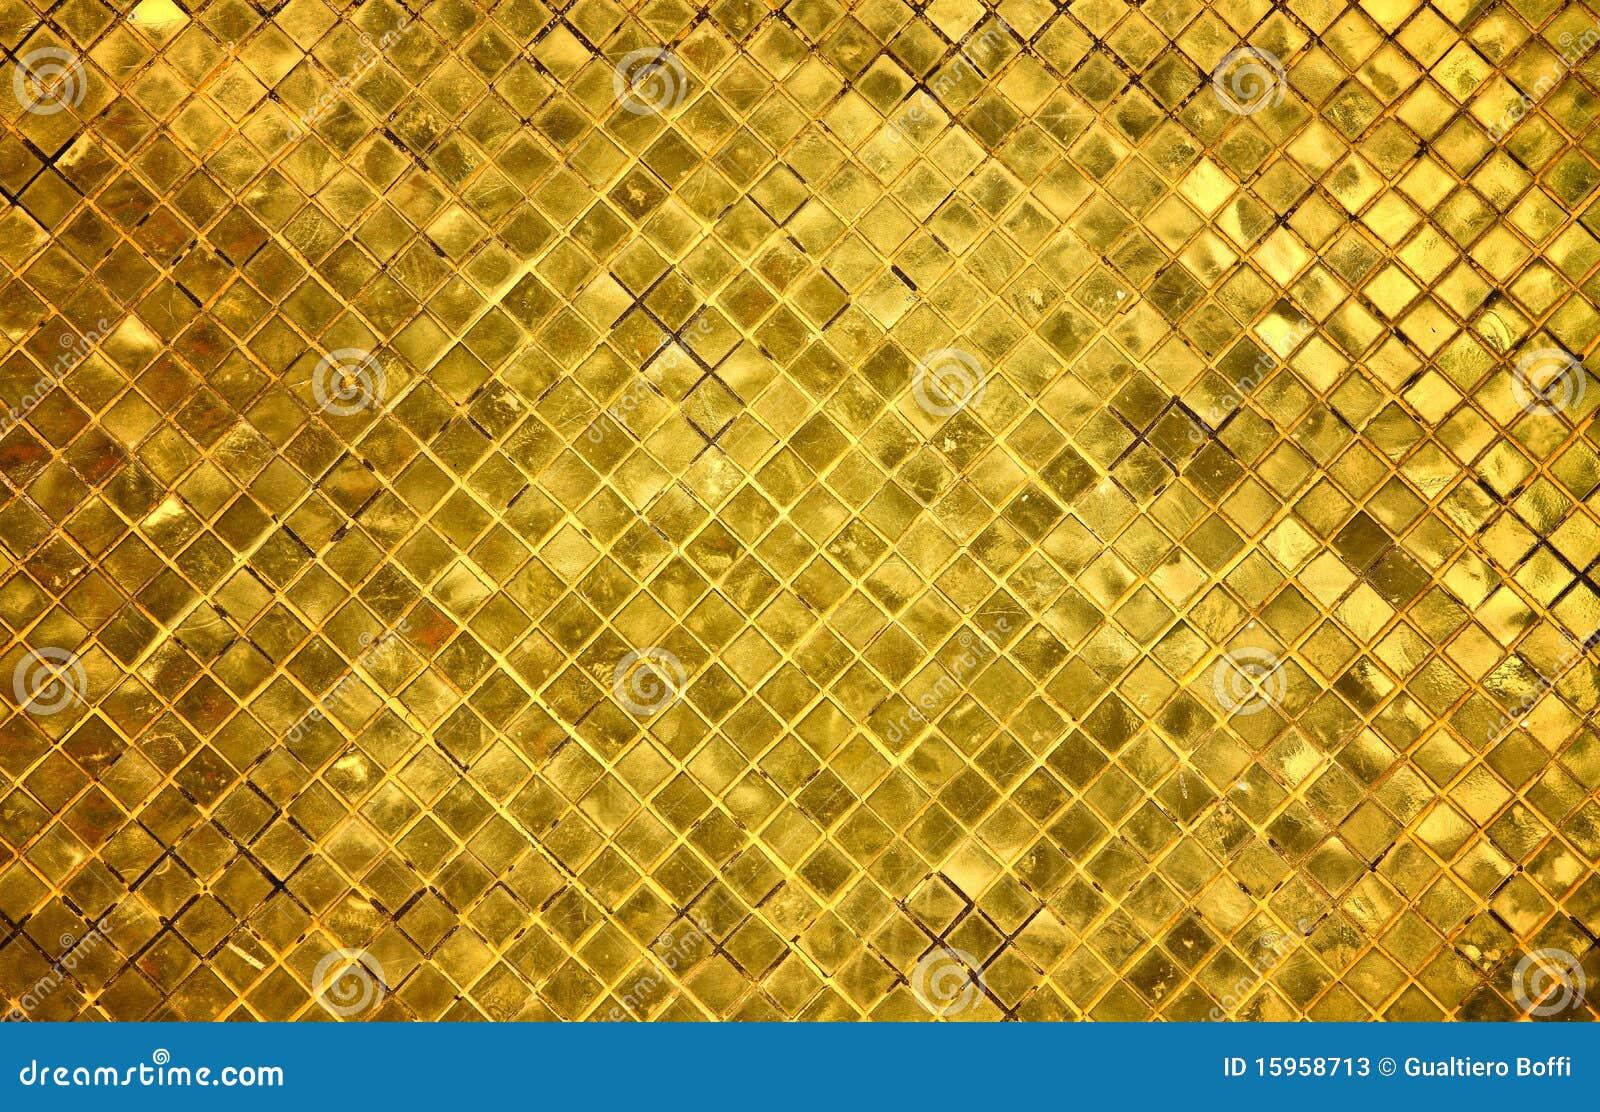 Golden Tiles Background Stock Photos - Image: 15958713